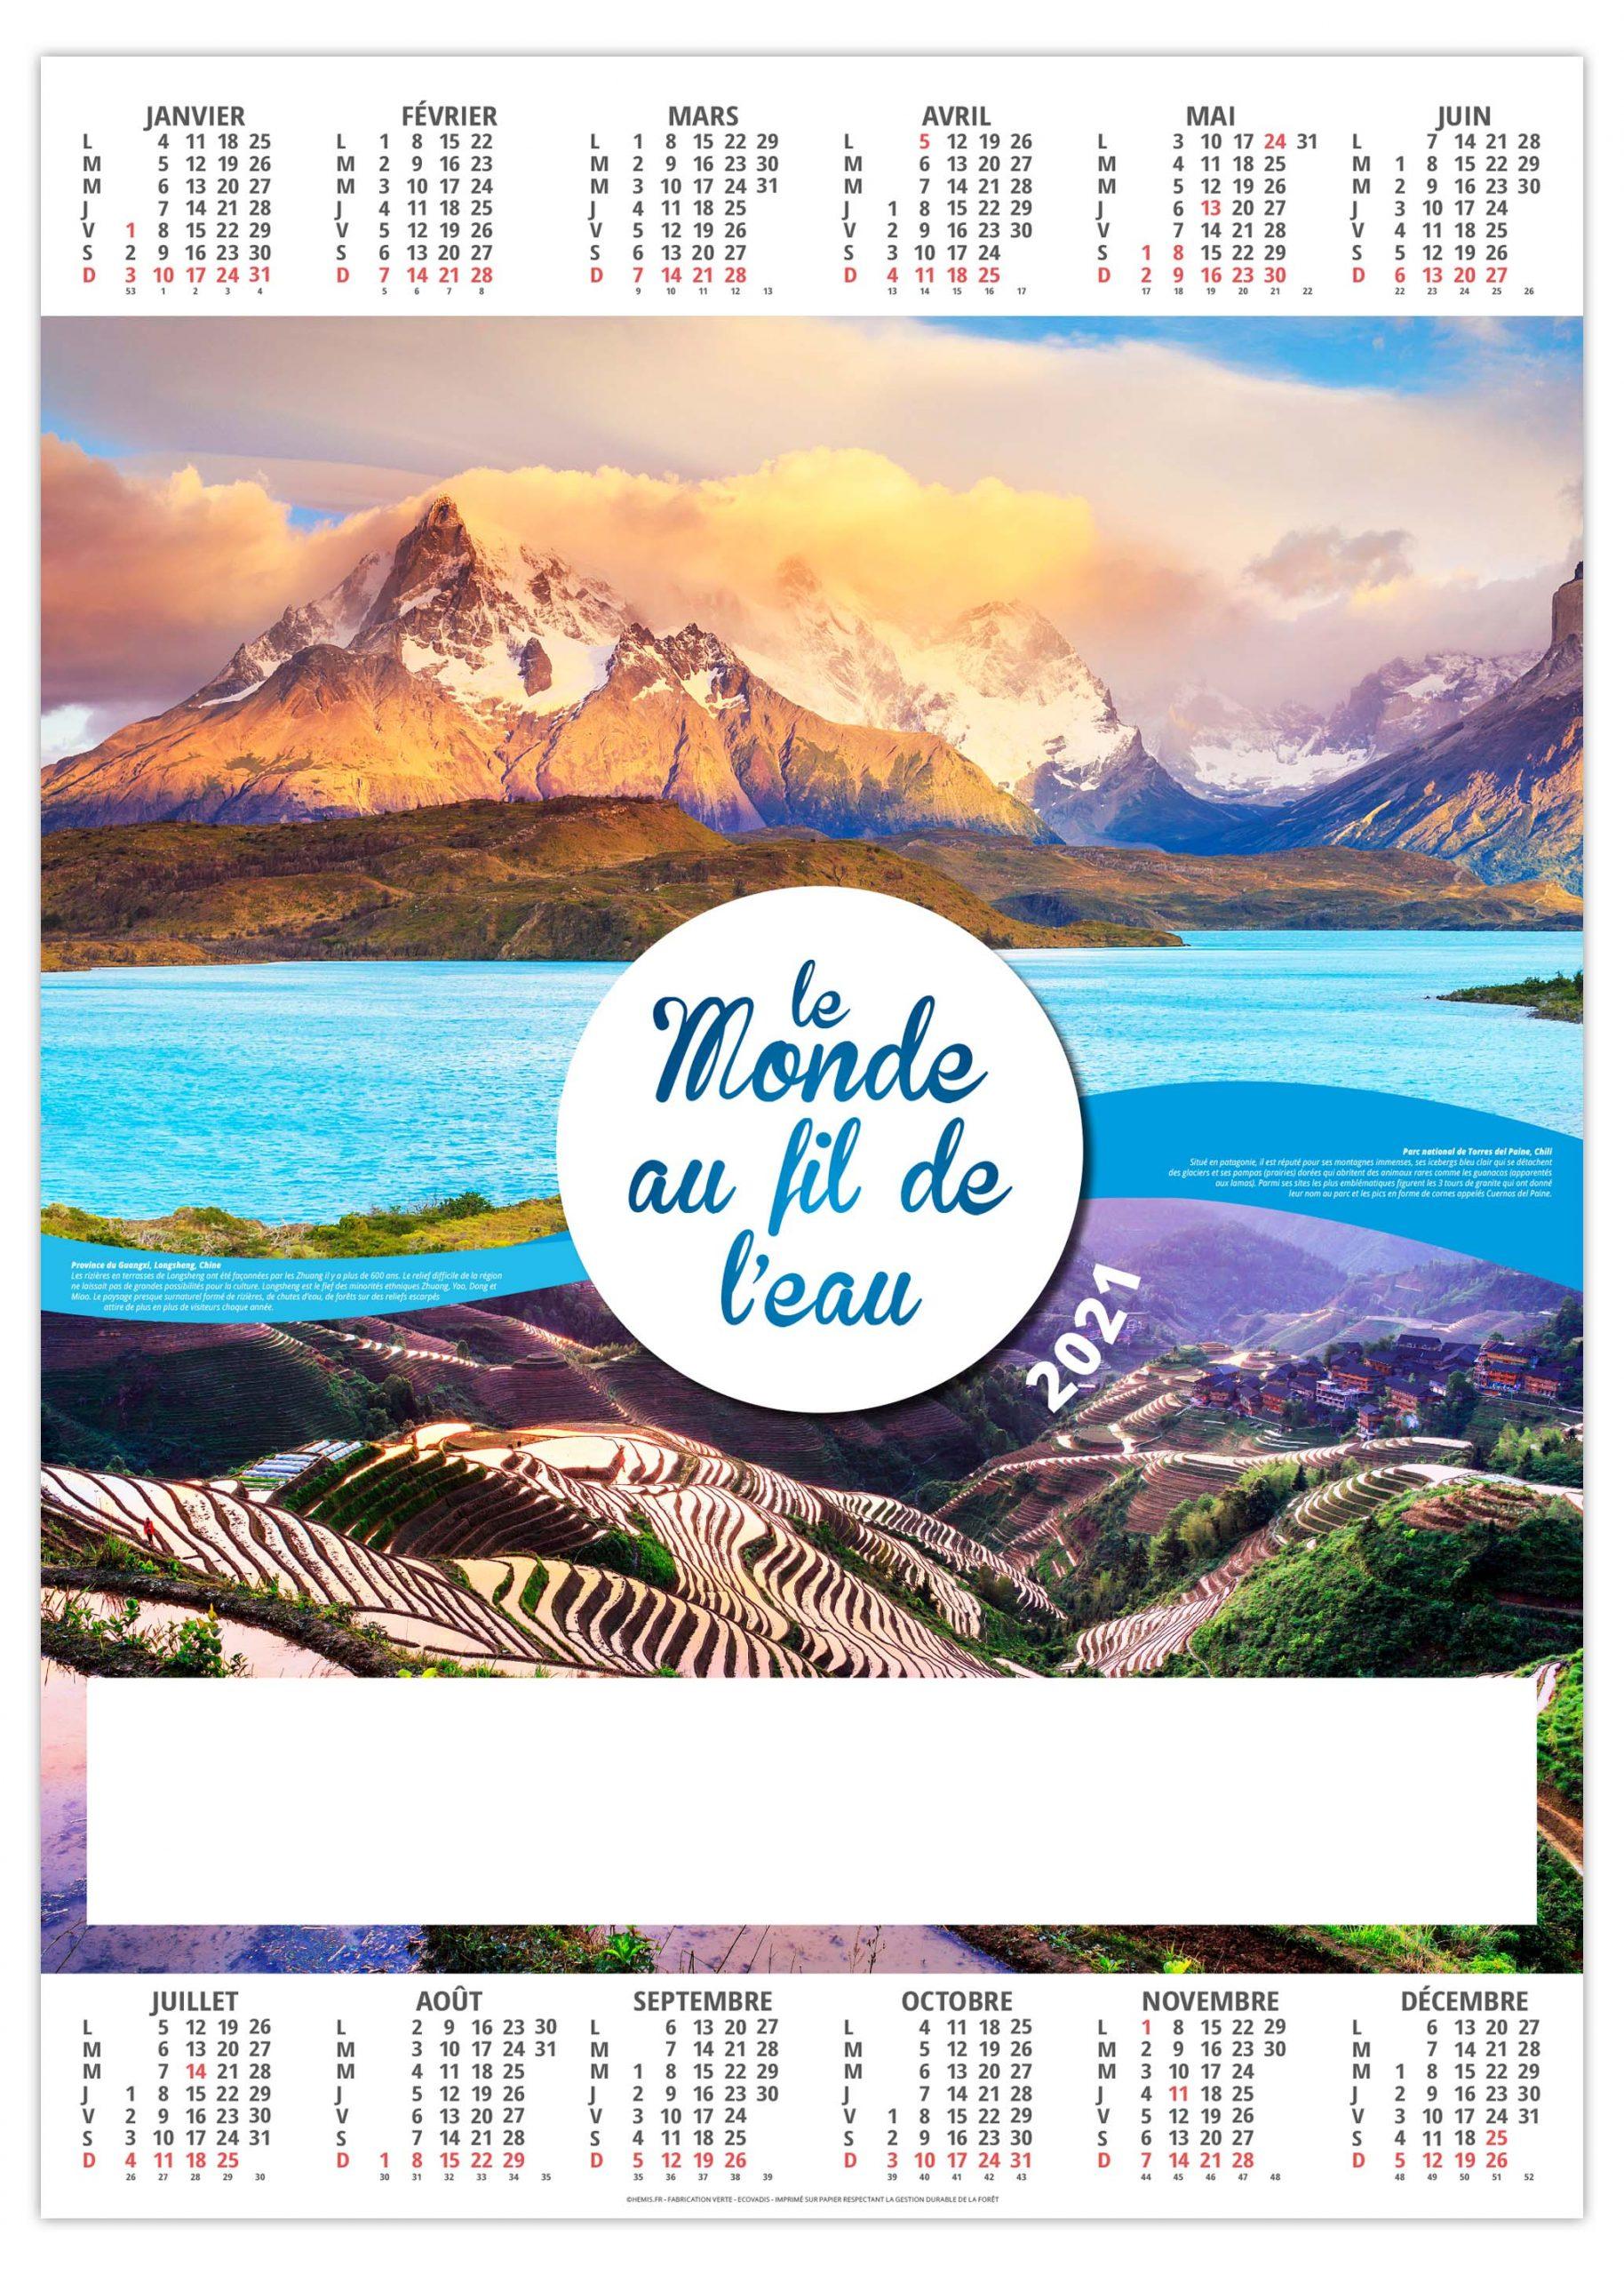 Poster Monde 2021   Calendrier 2021   Sérigraphie & Impression APO Pub